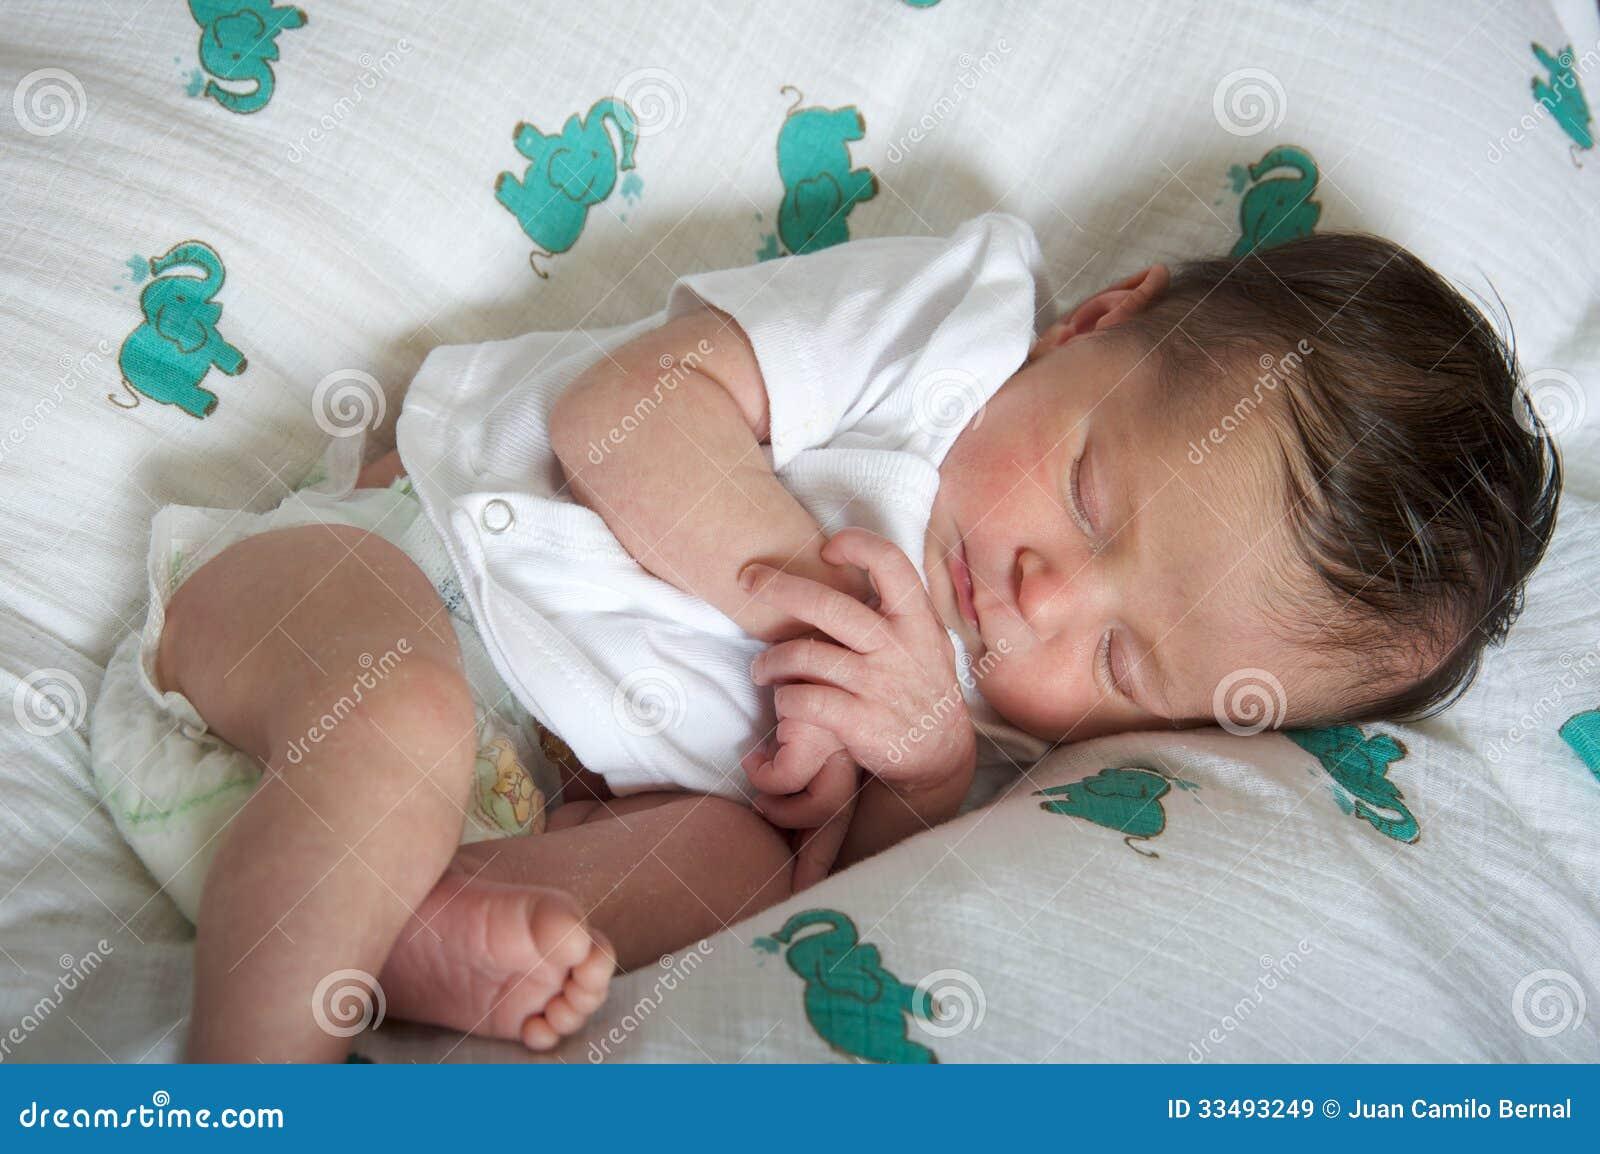 Download latin newborn baby girl sleeping peacefully stock image image of hispanic woman